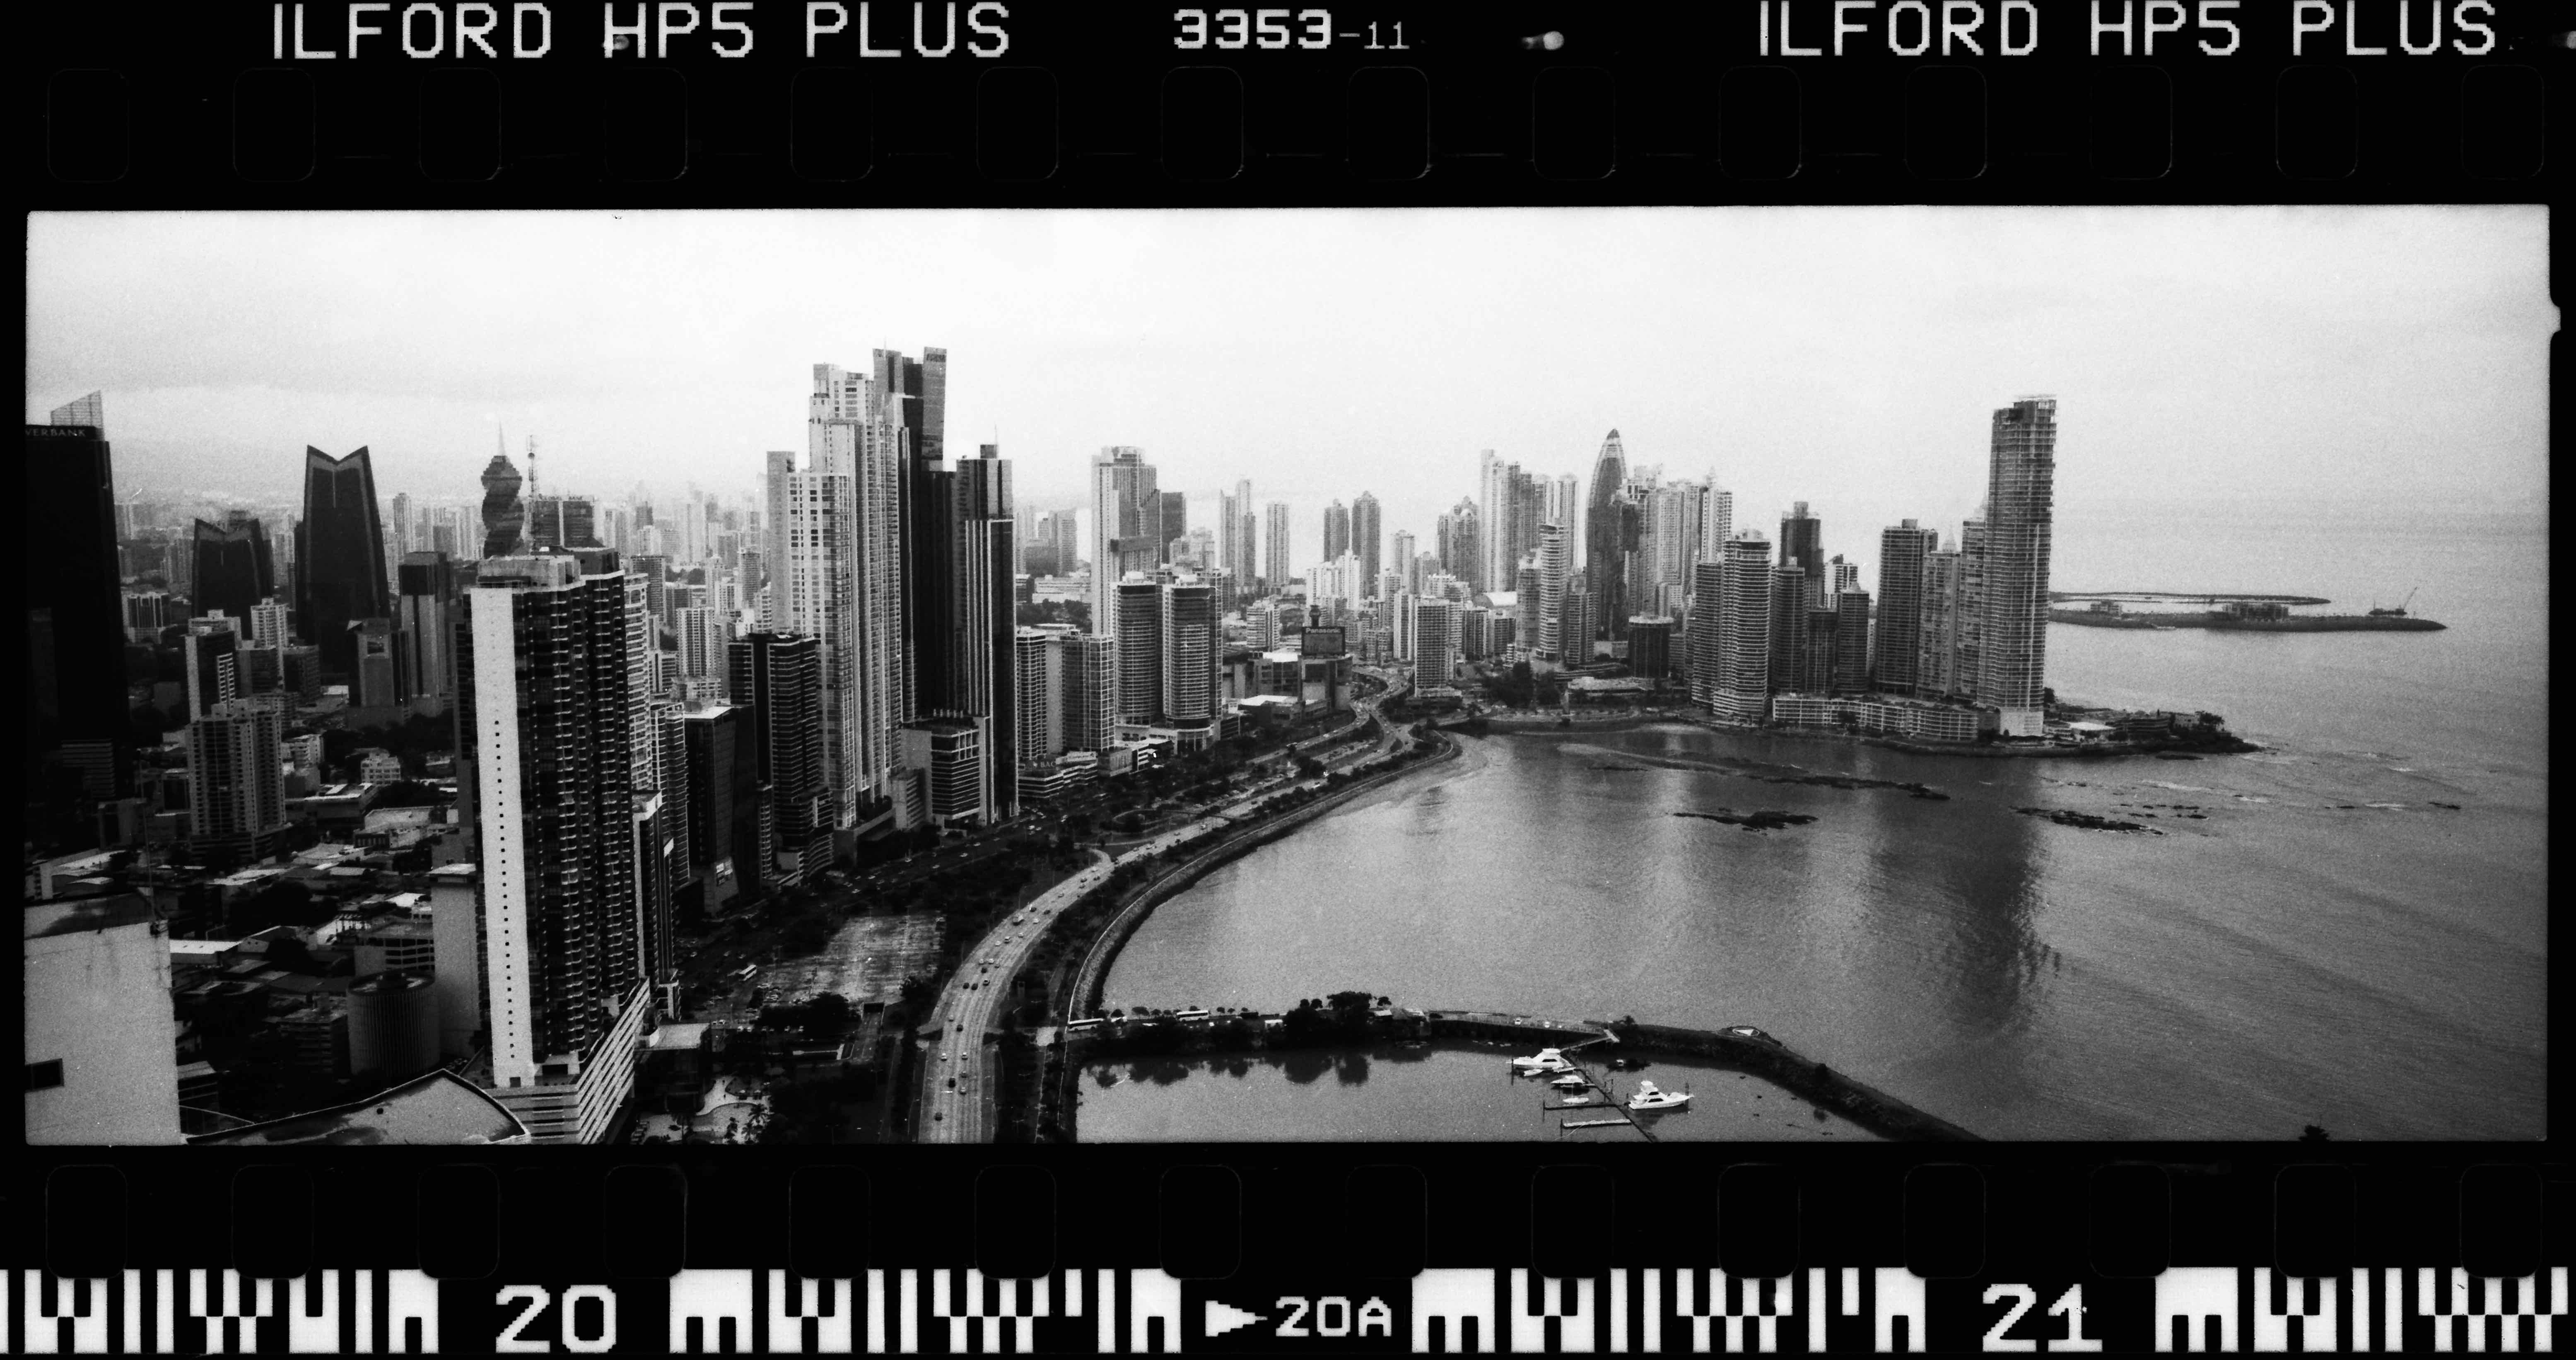 Rafael Gonzalez 01 - Panama city